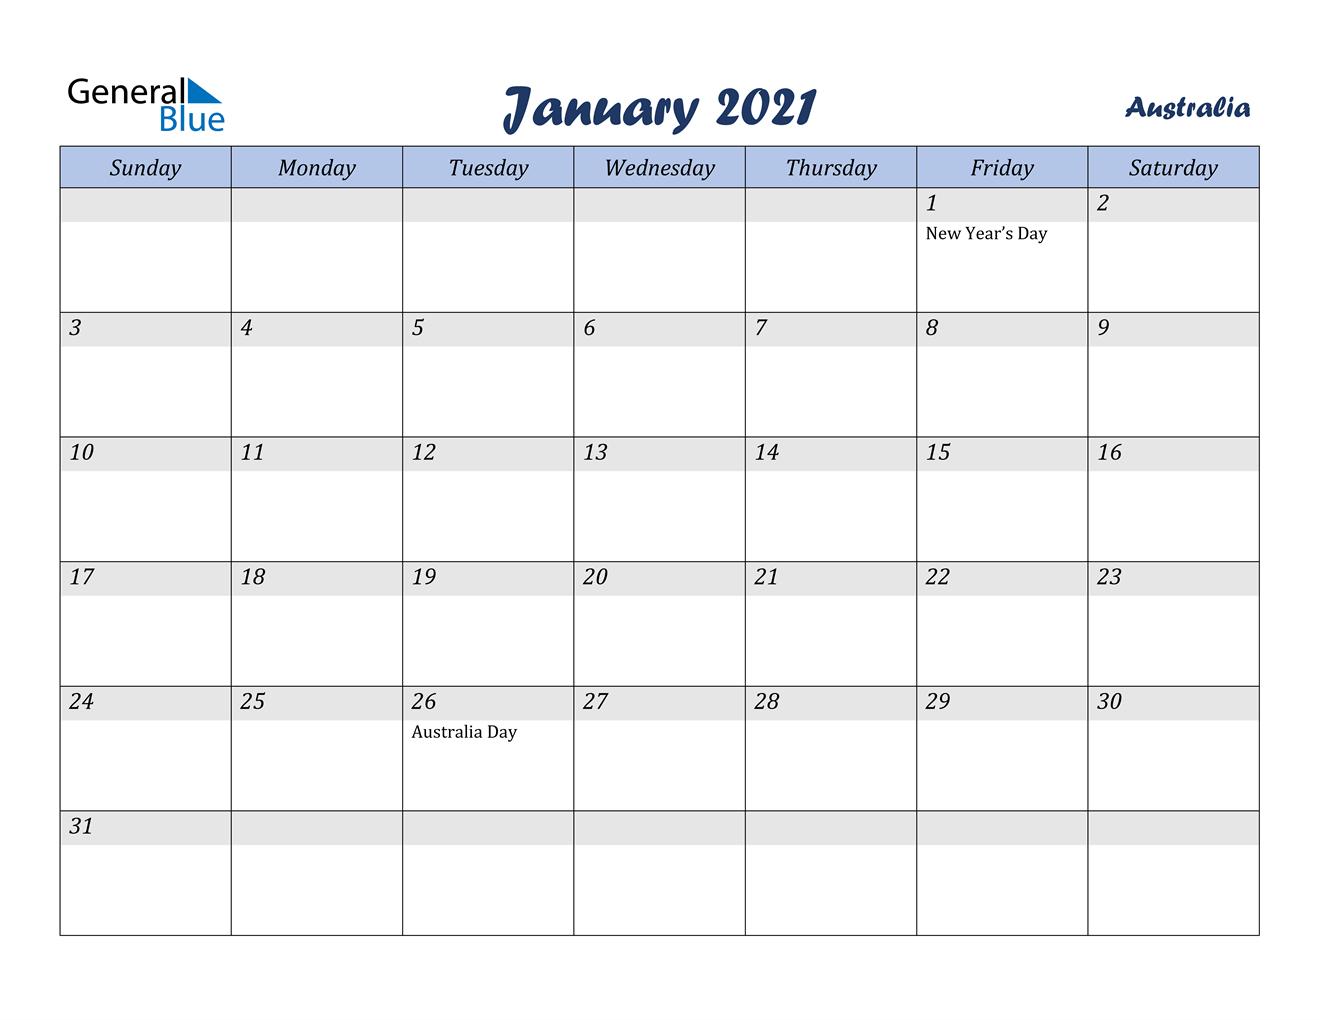 January 2021 Calendar - Australia December 2020 January 2021 Calendar Australia